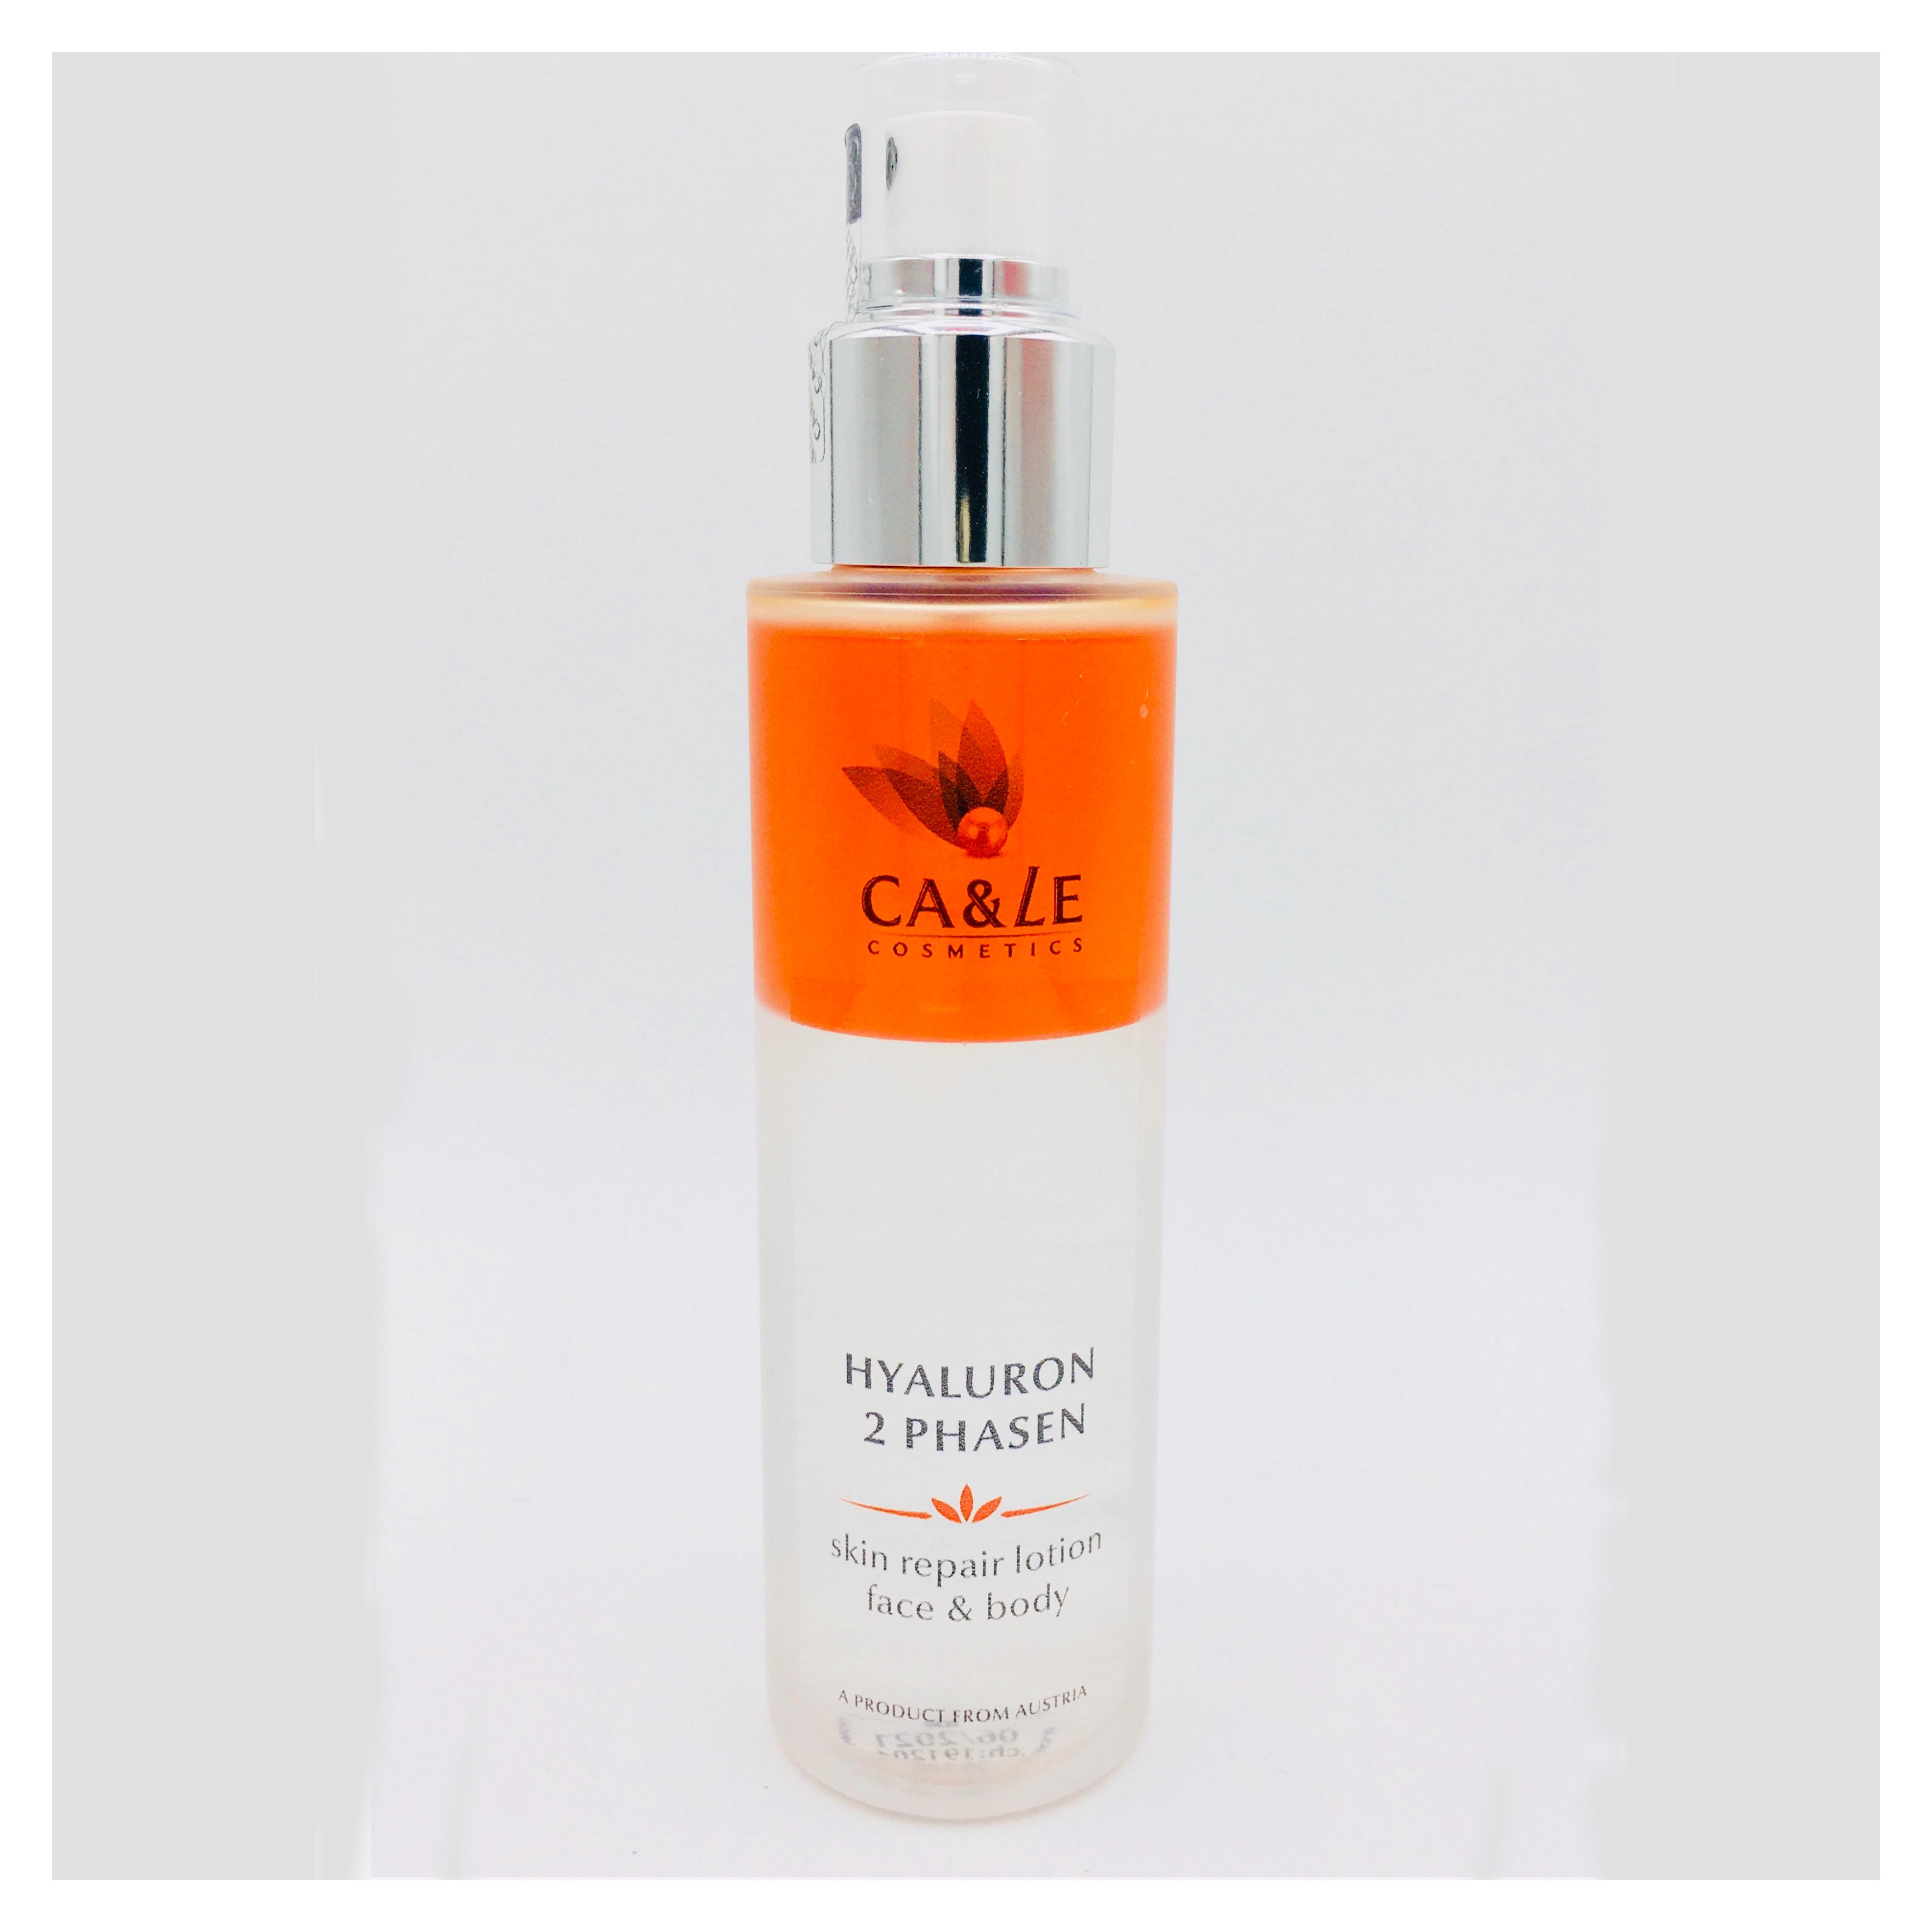 CA&LE Hyaluron 2Phasen Skin Repair Lotion